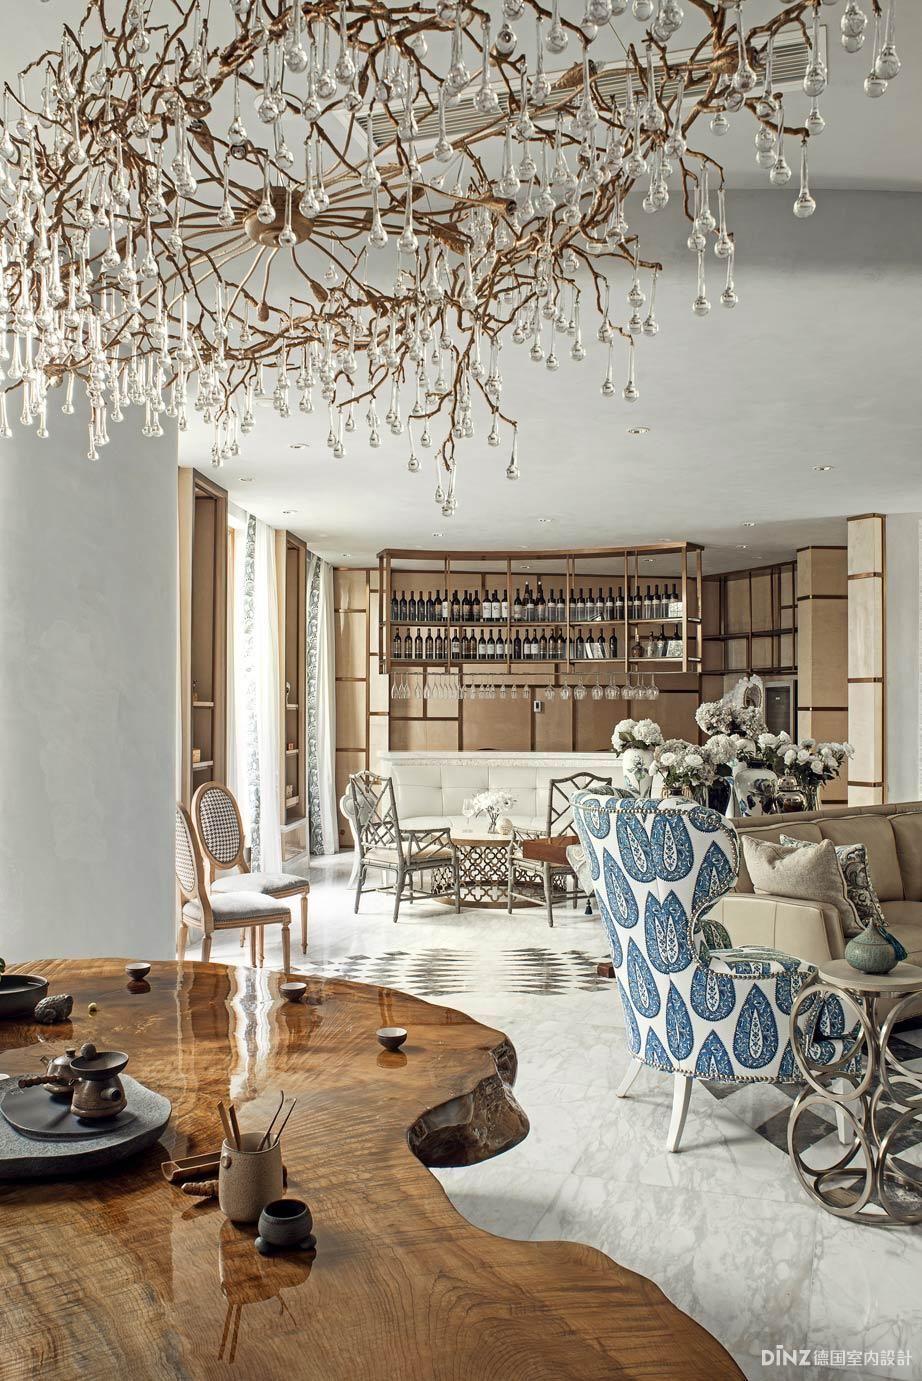 Richmond hospitality interior design around the world for Hotel home decor